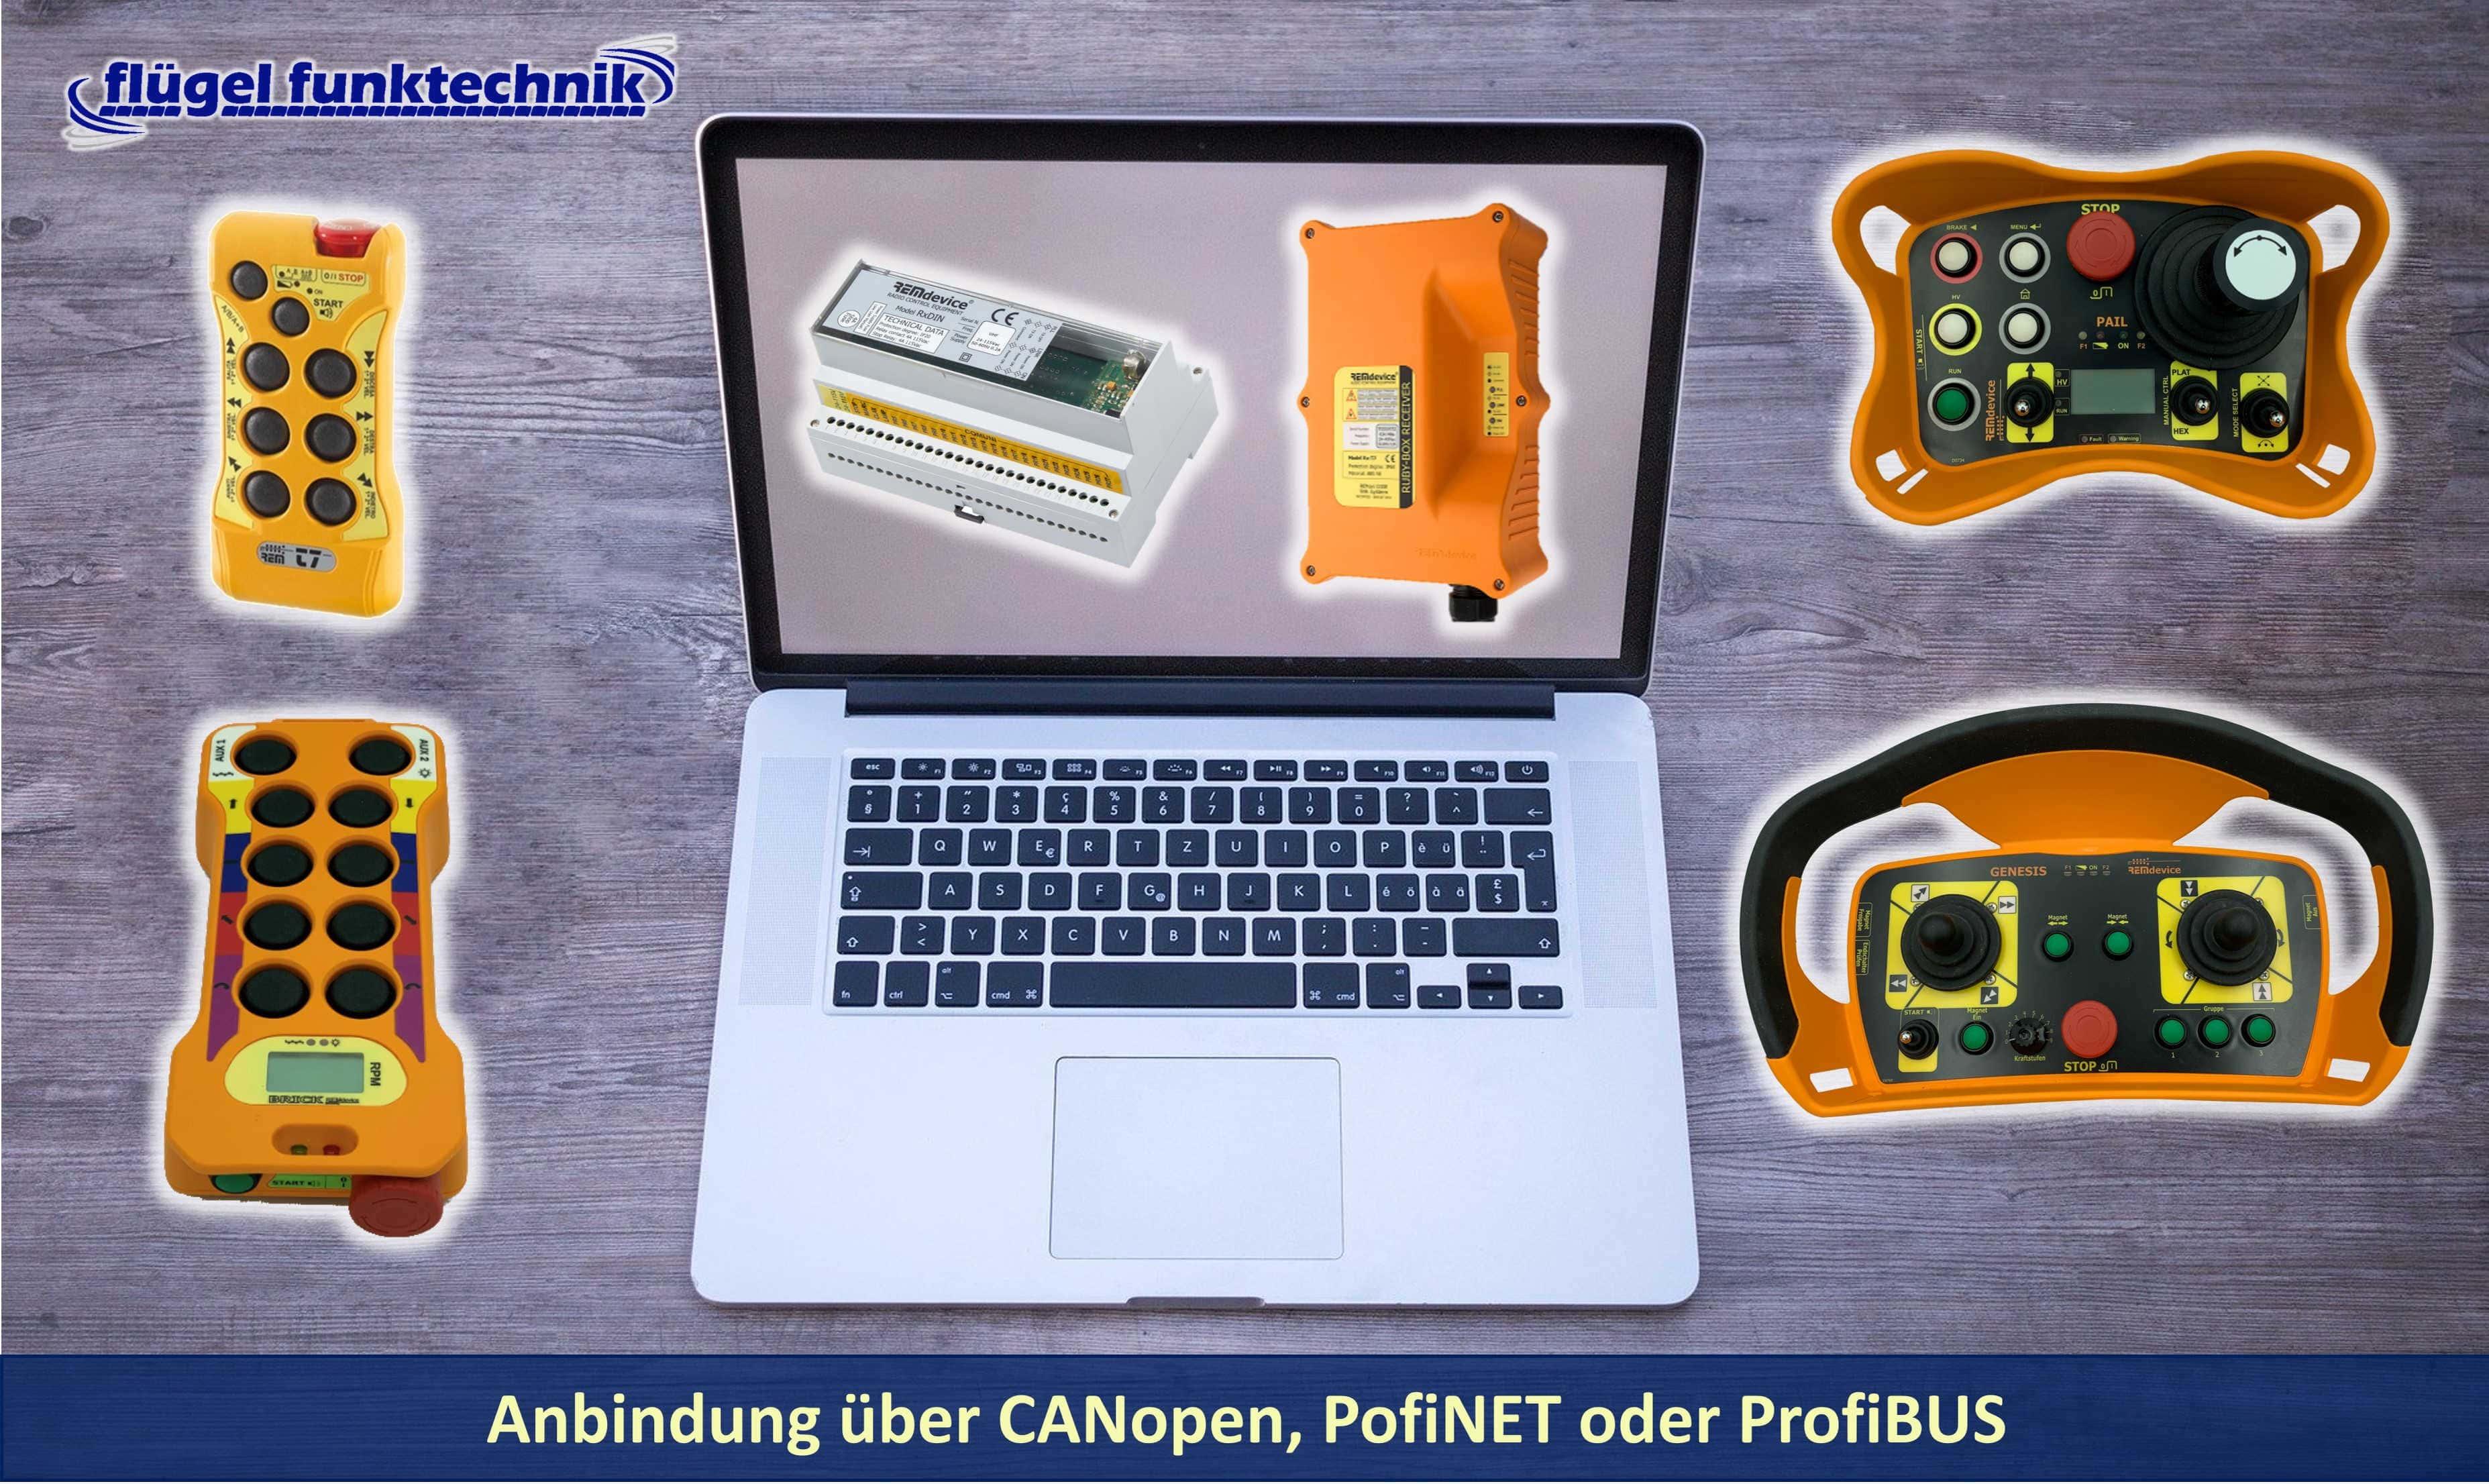 Anbindung über CANopen, ProfiNET, Profibus